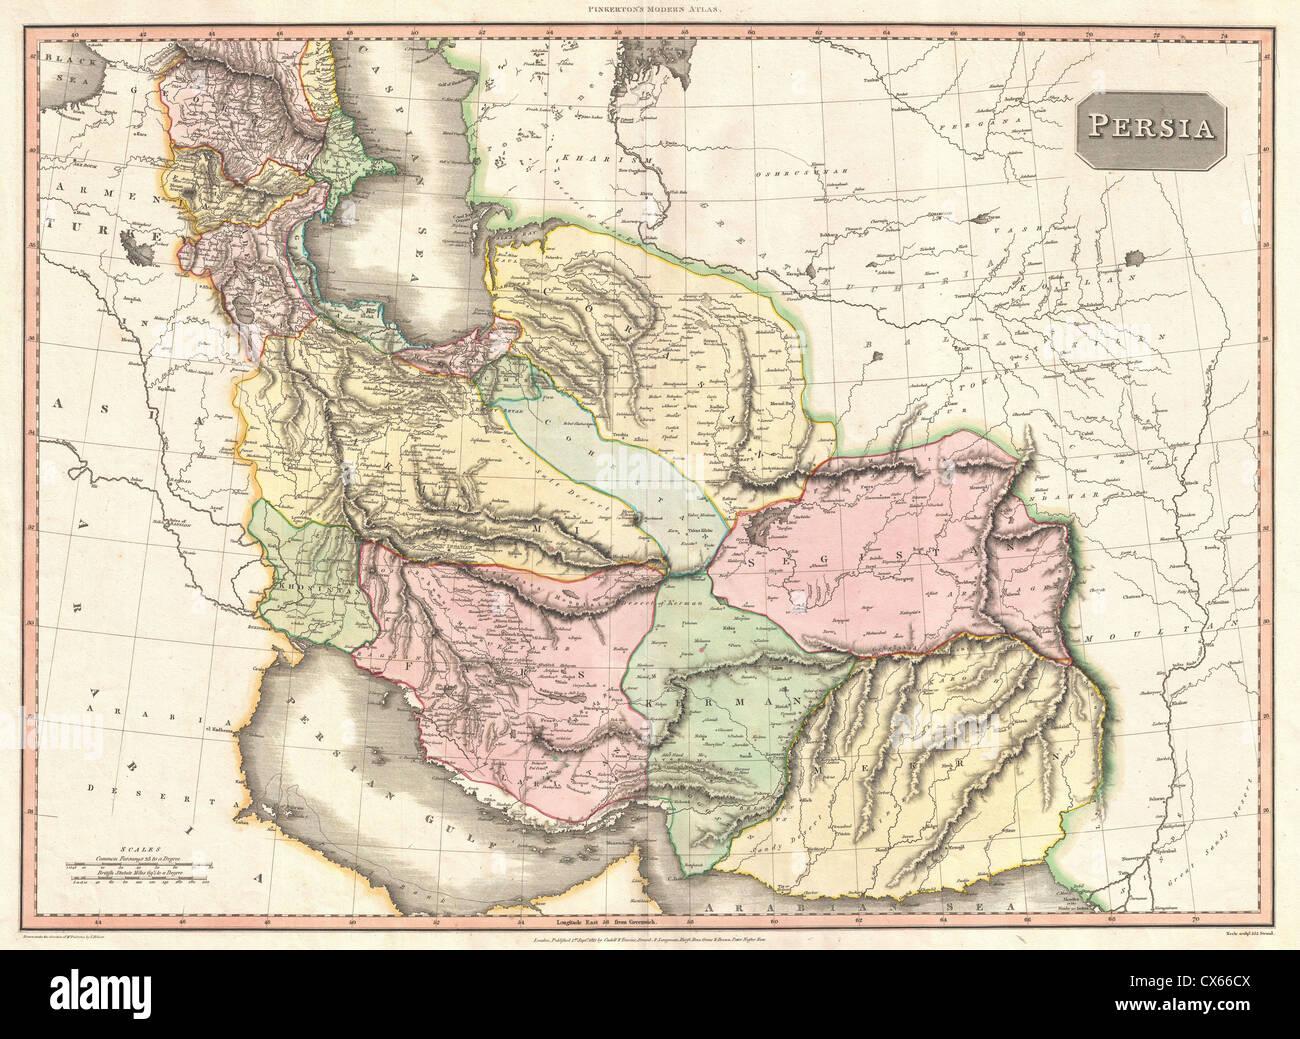 1811 Pinkerton Map of Persia ( Iraq, Iran, Afghanistan) - Stock Image